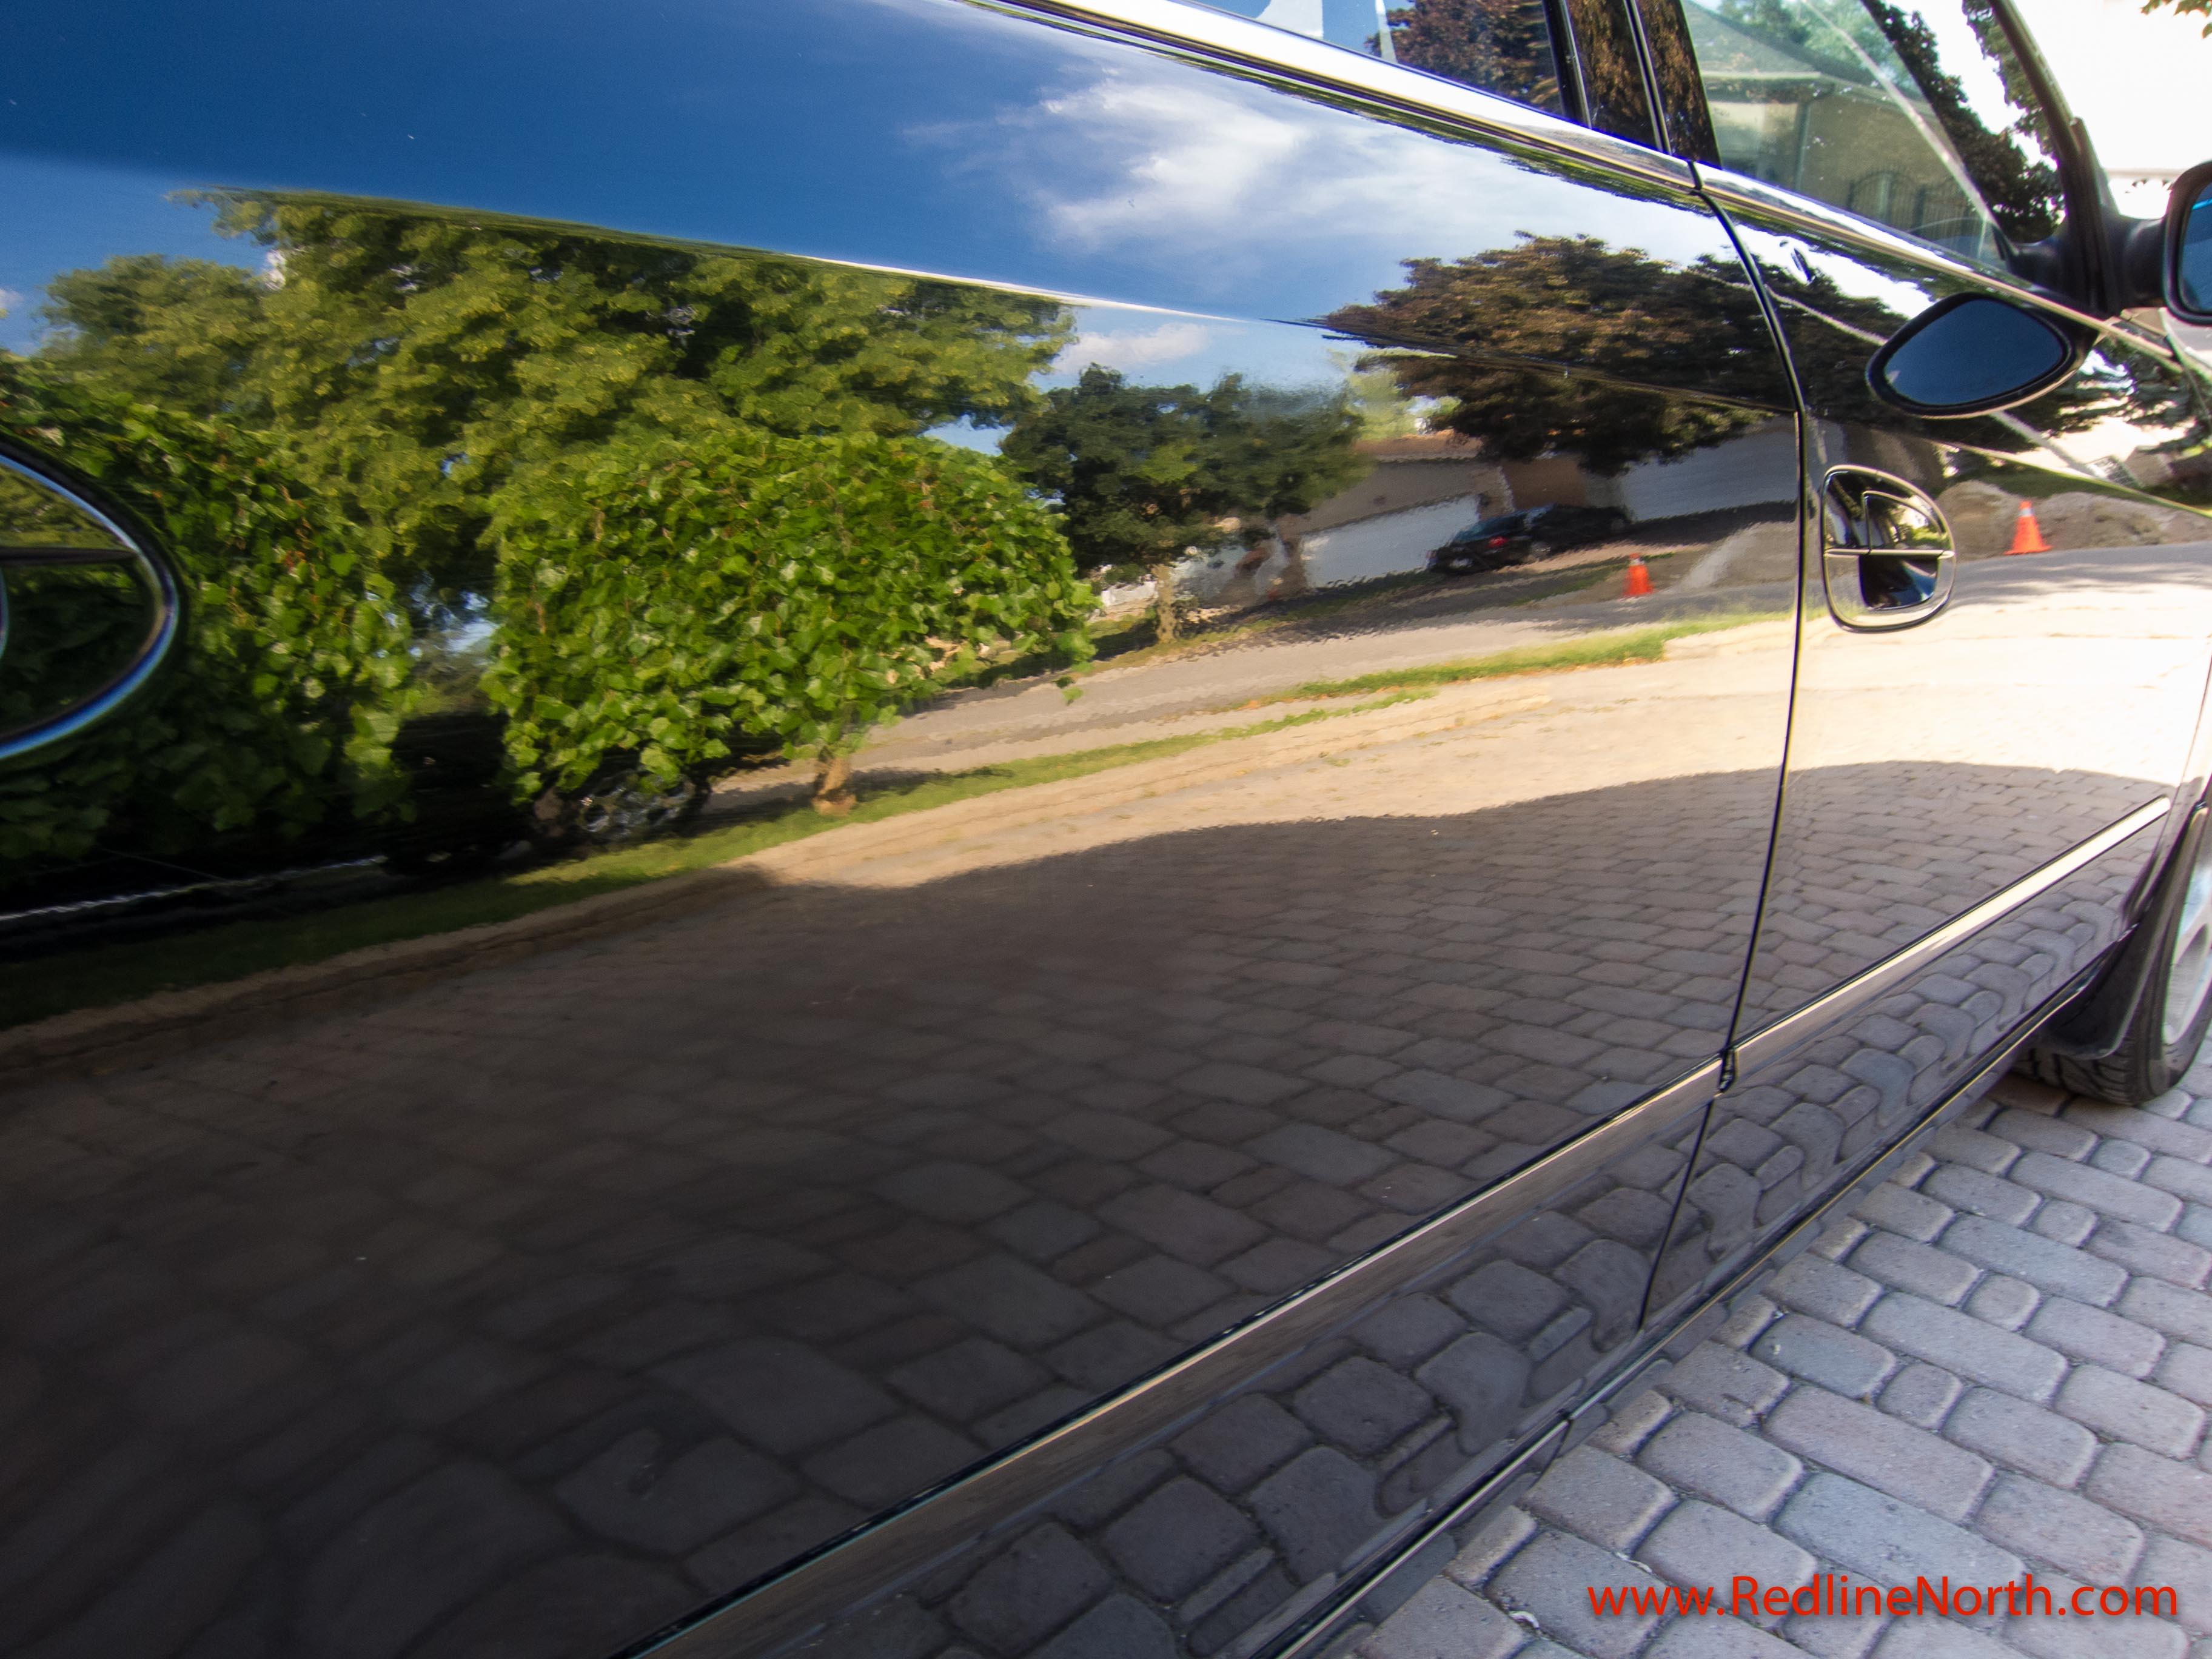 Goclean Waterless Car Wash Review